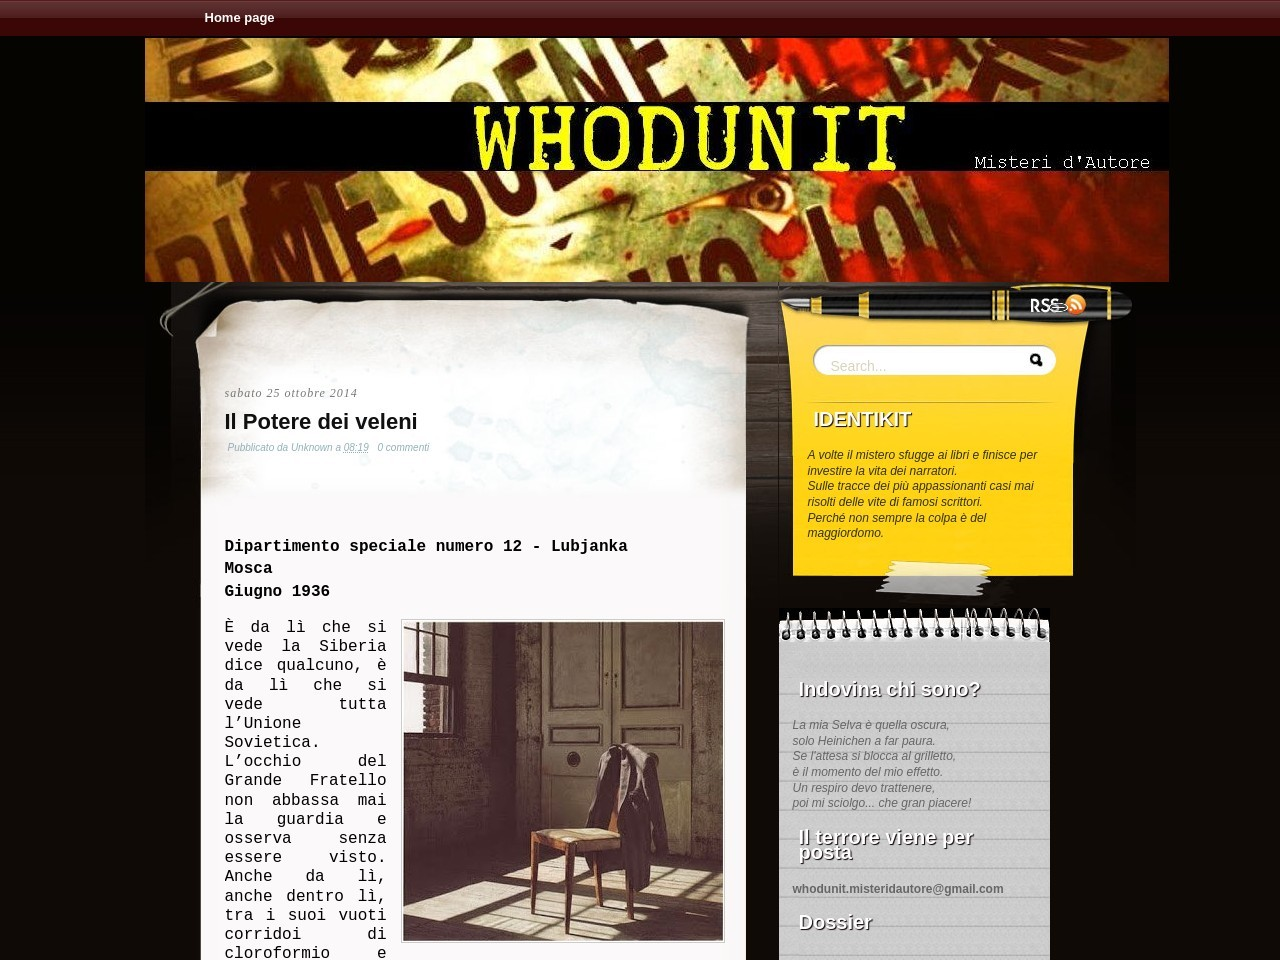 whodunit-misteri-dautore